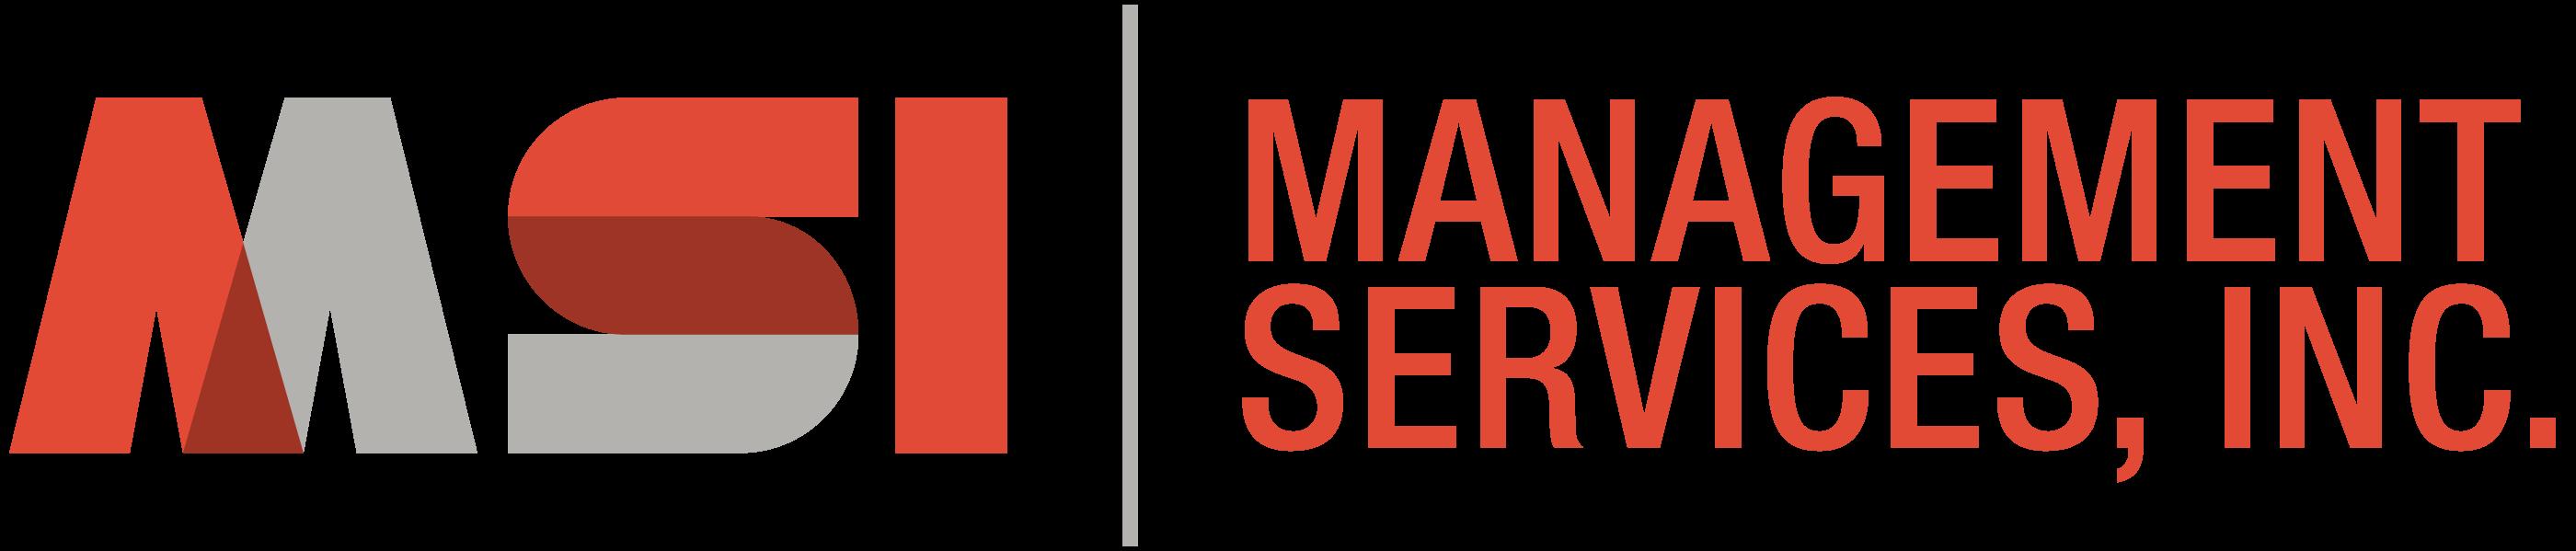 MSI Management Services, Inc.